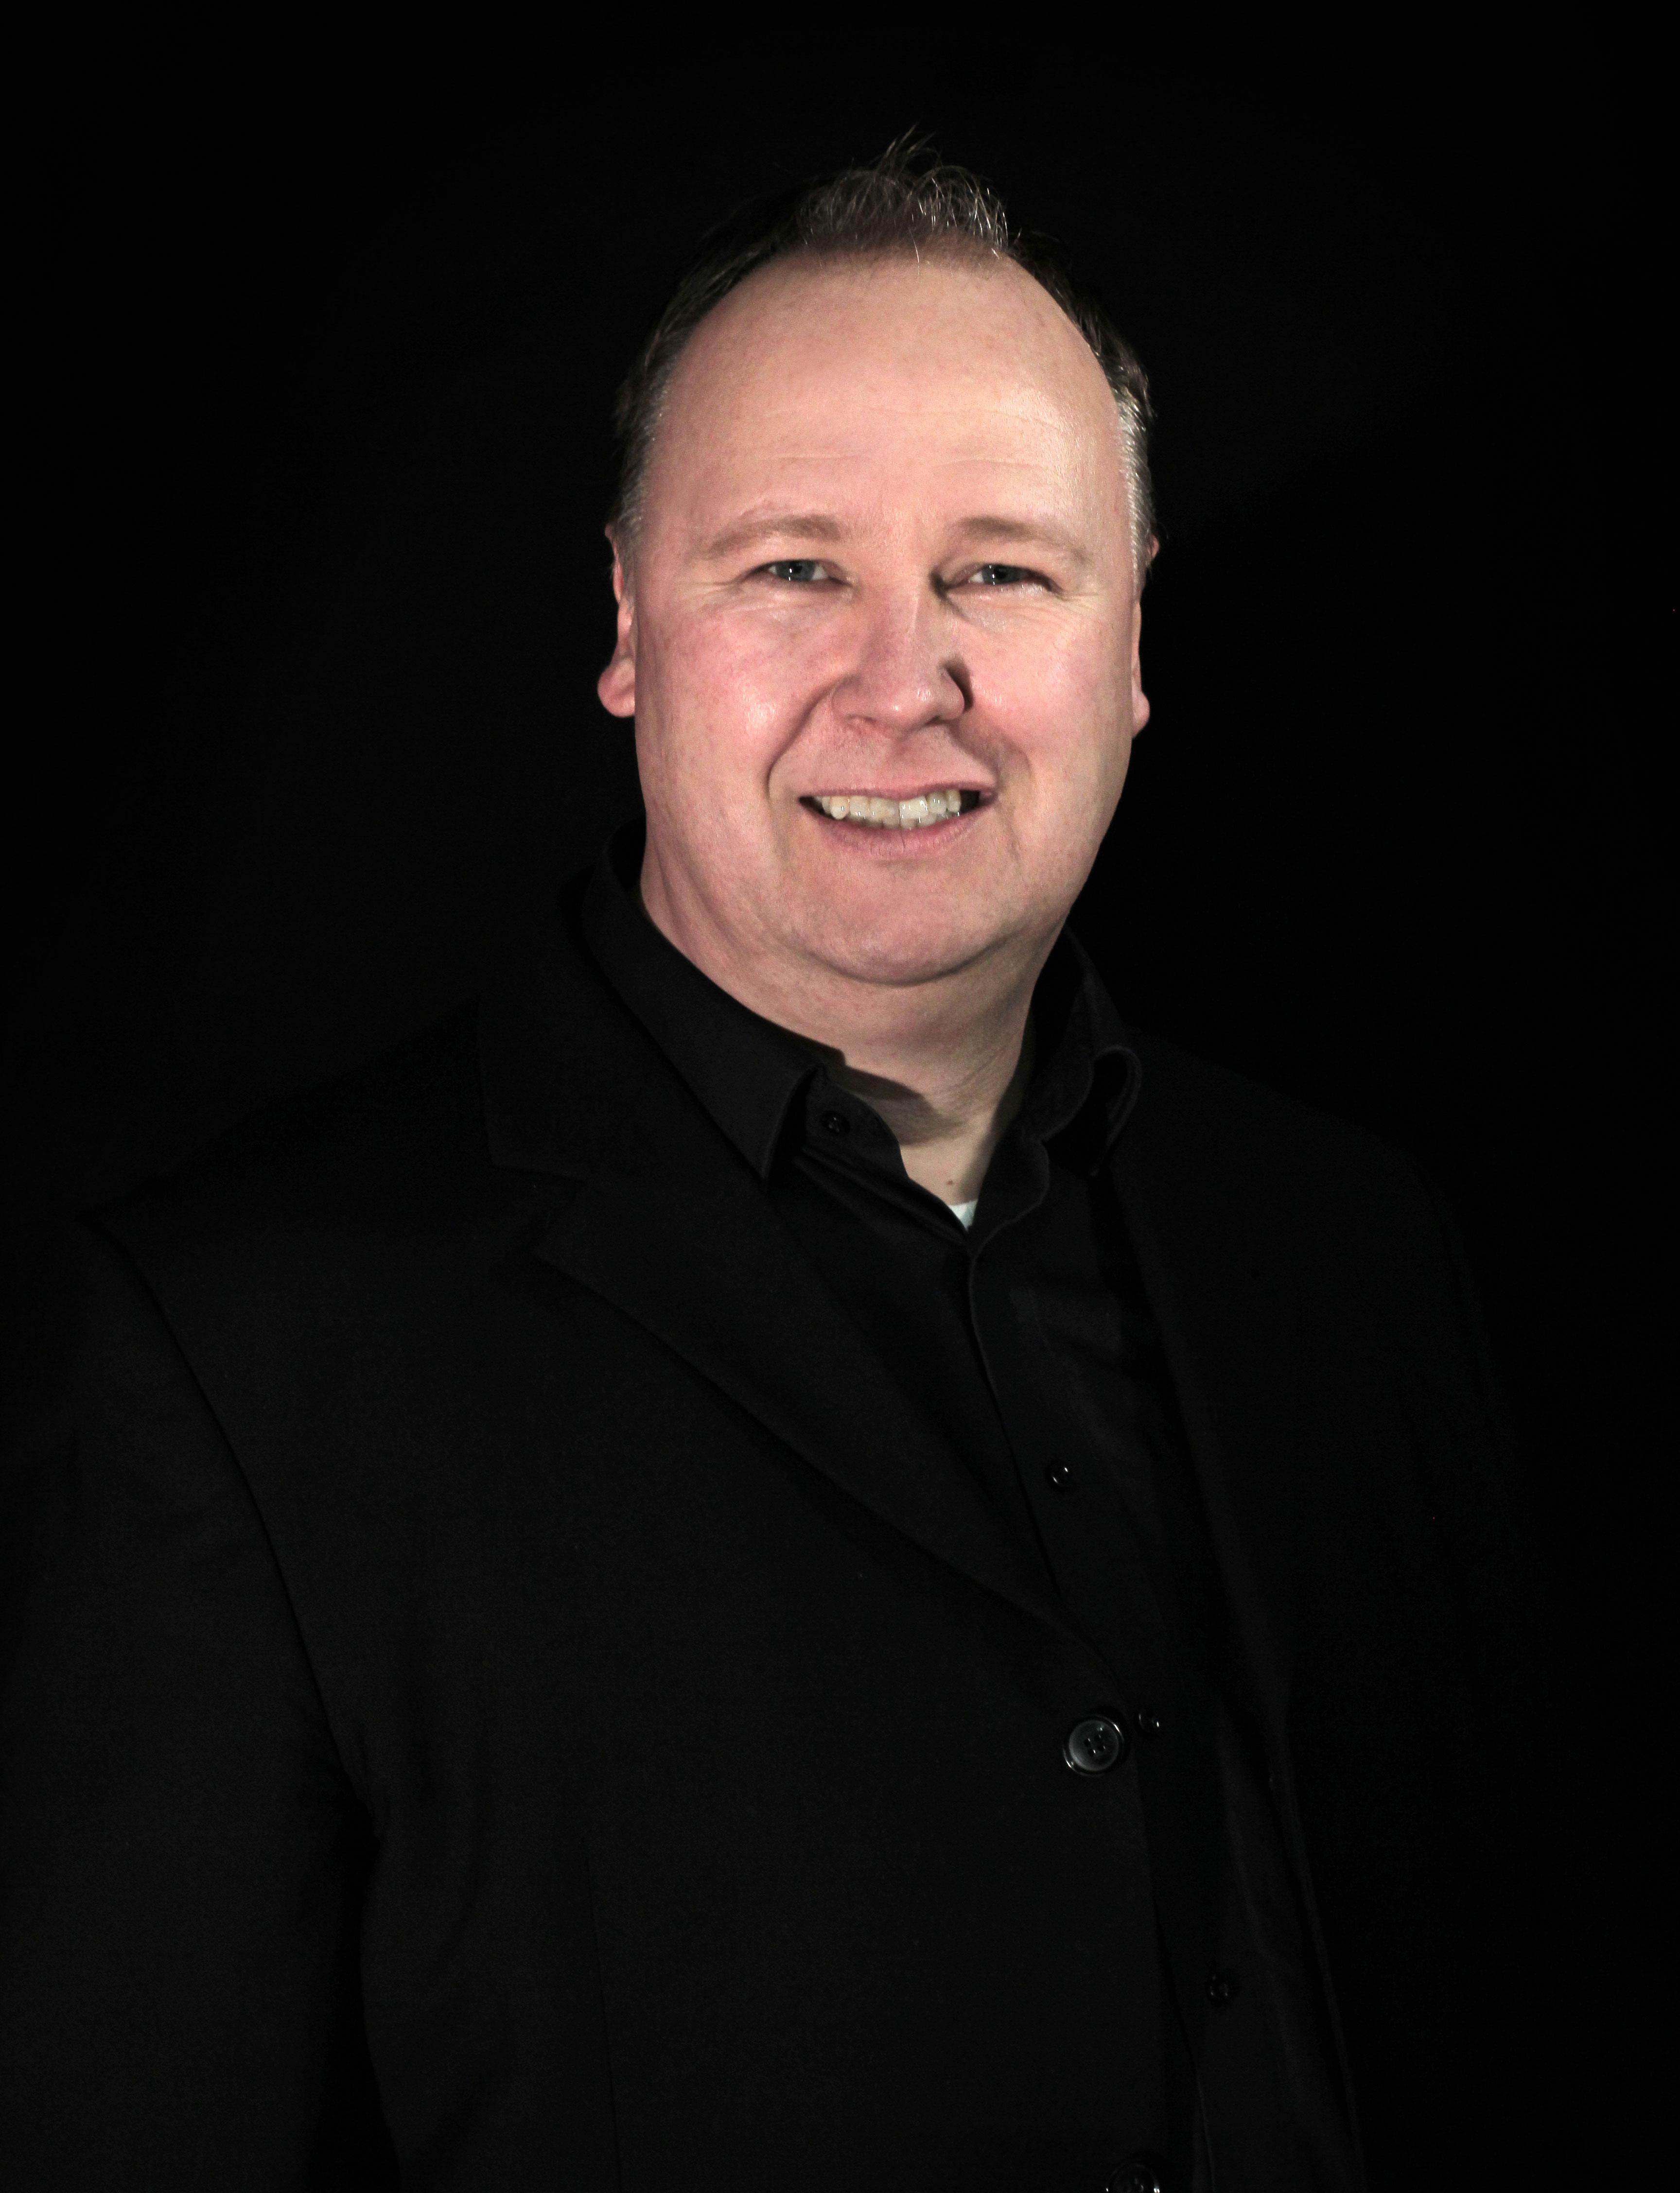 Michael Rottmann